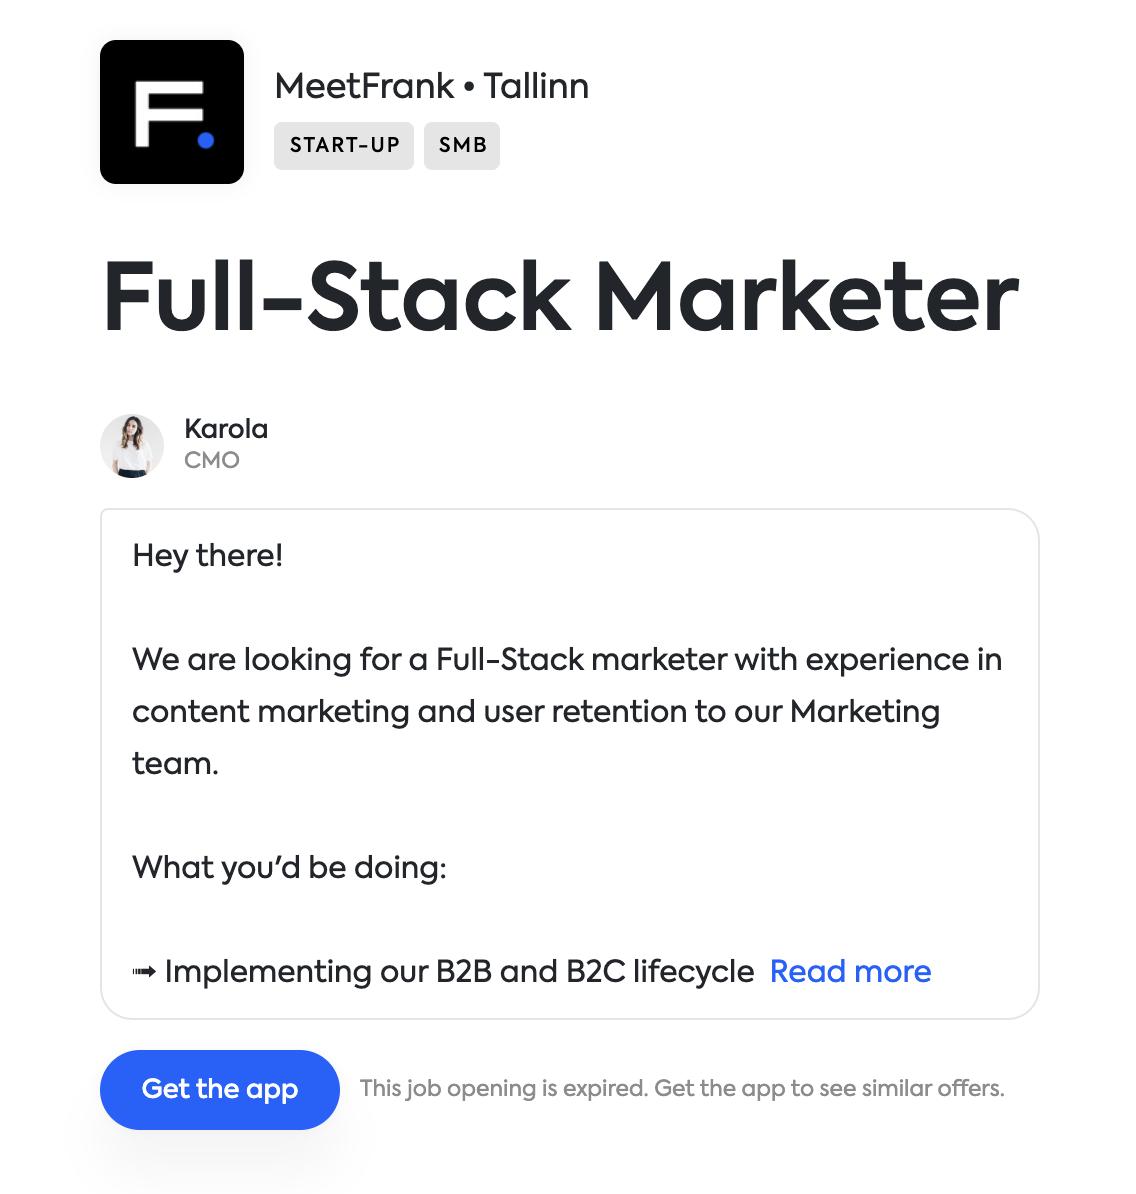 Apply via the MeetFrank app